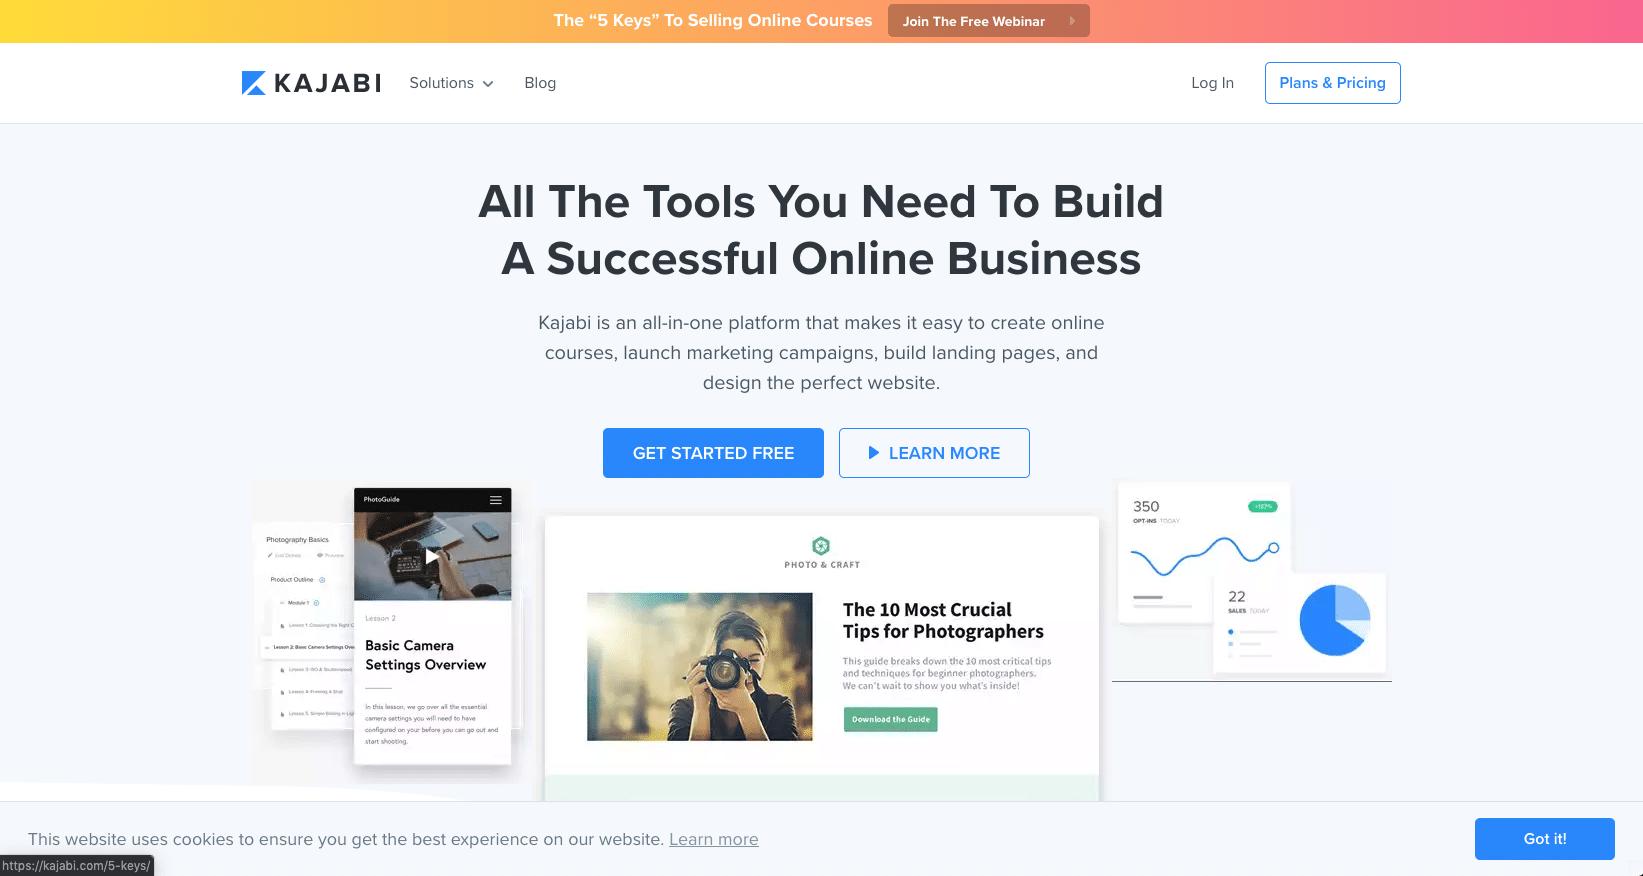 Kajabi - The All-In-One Online Business Platform